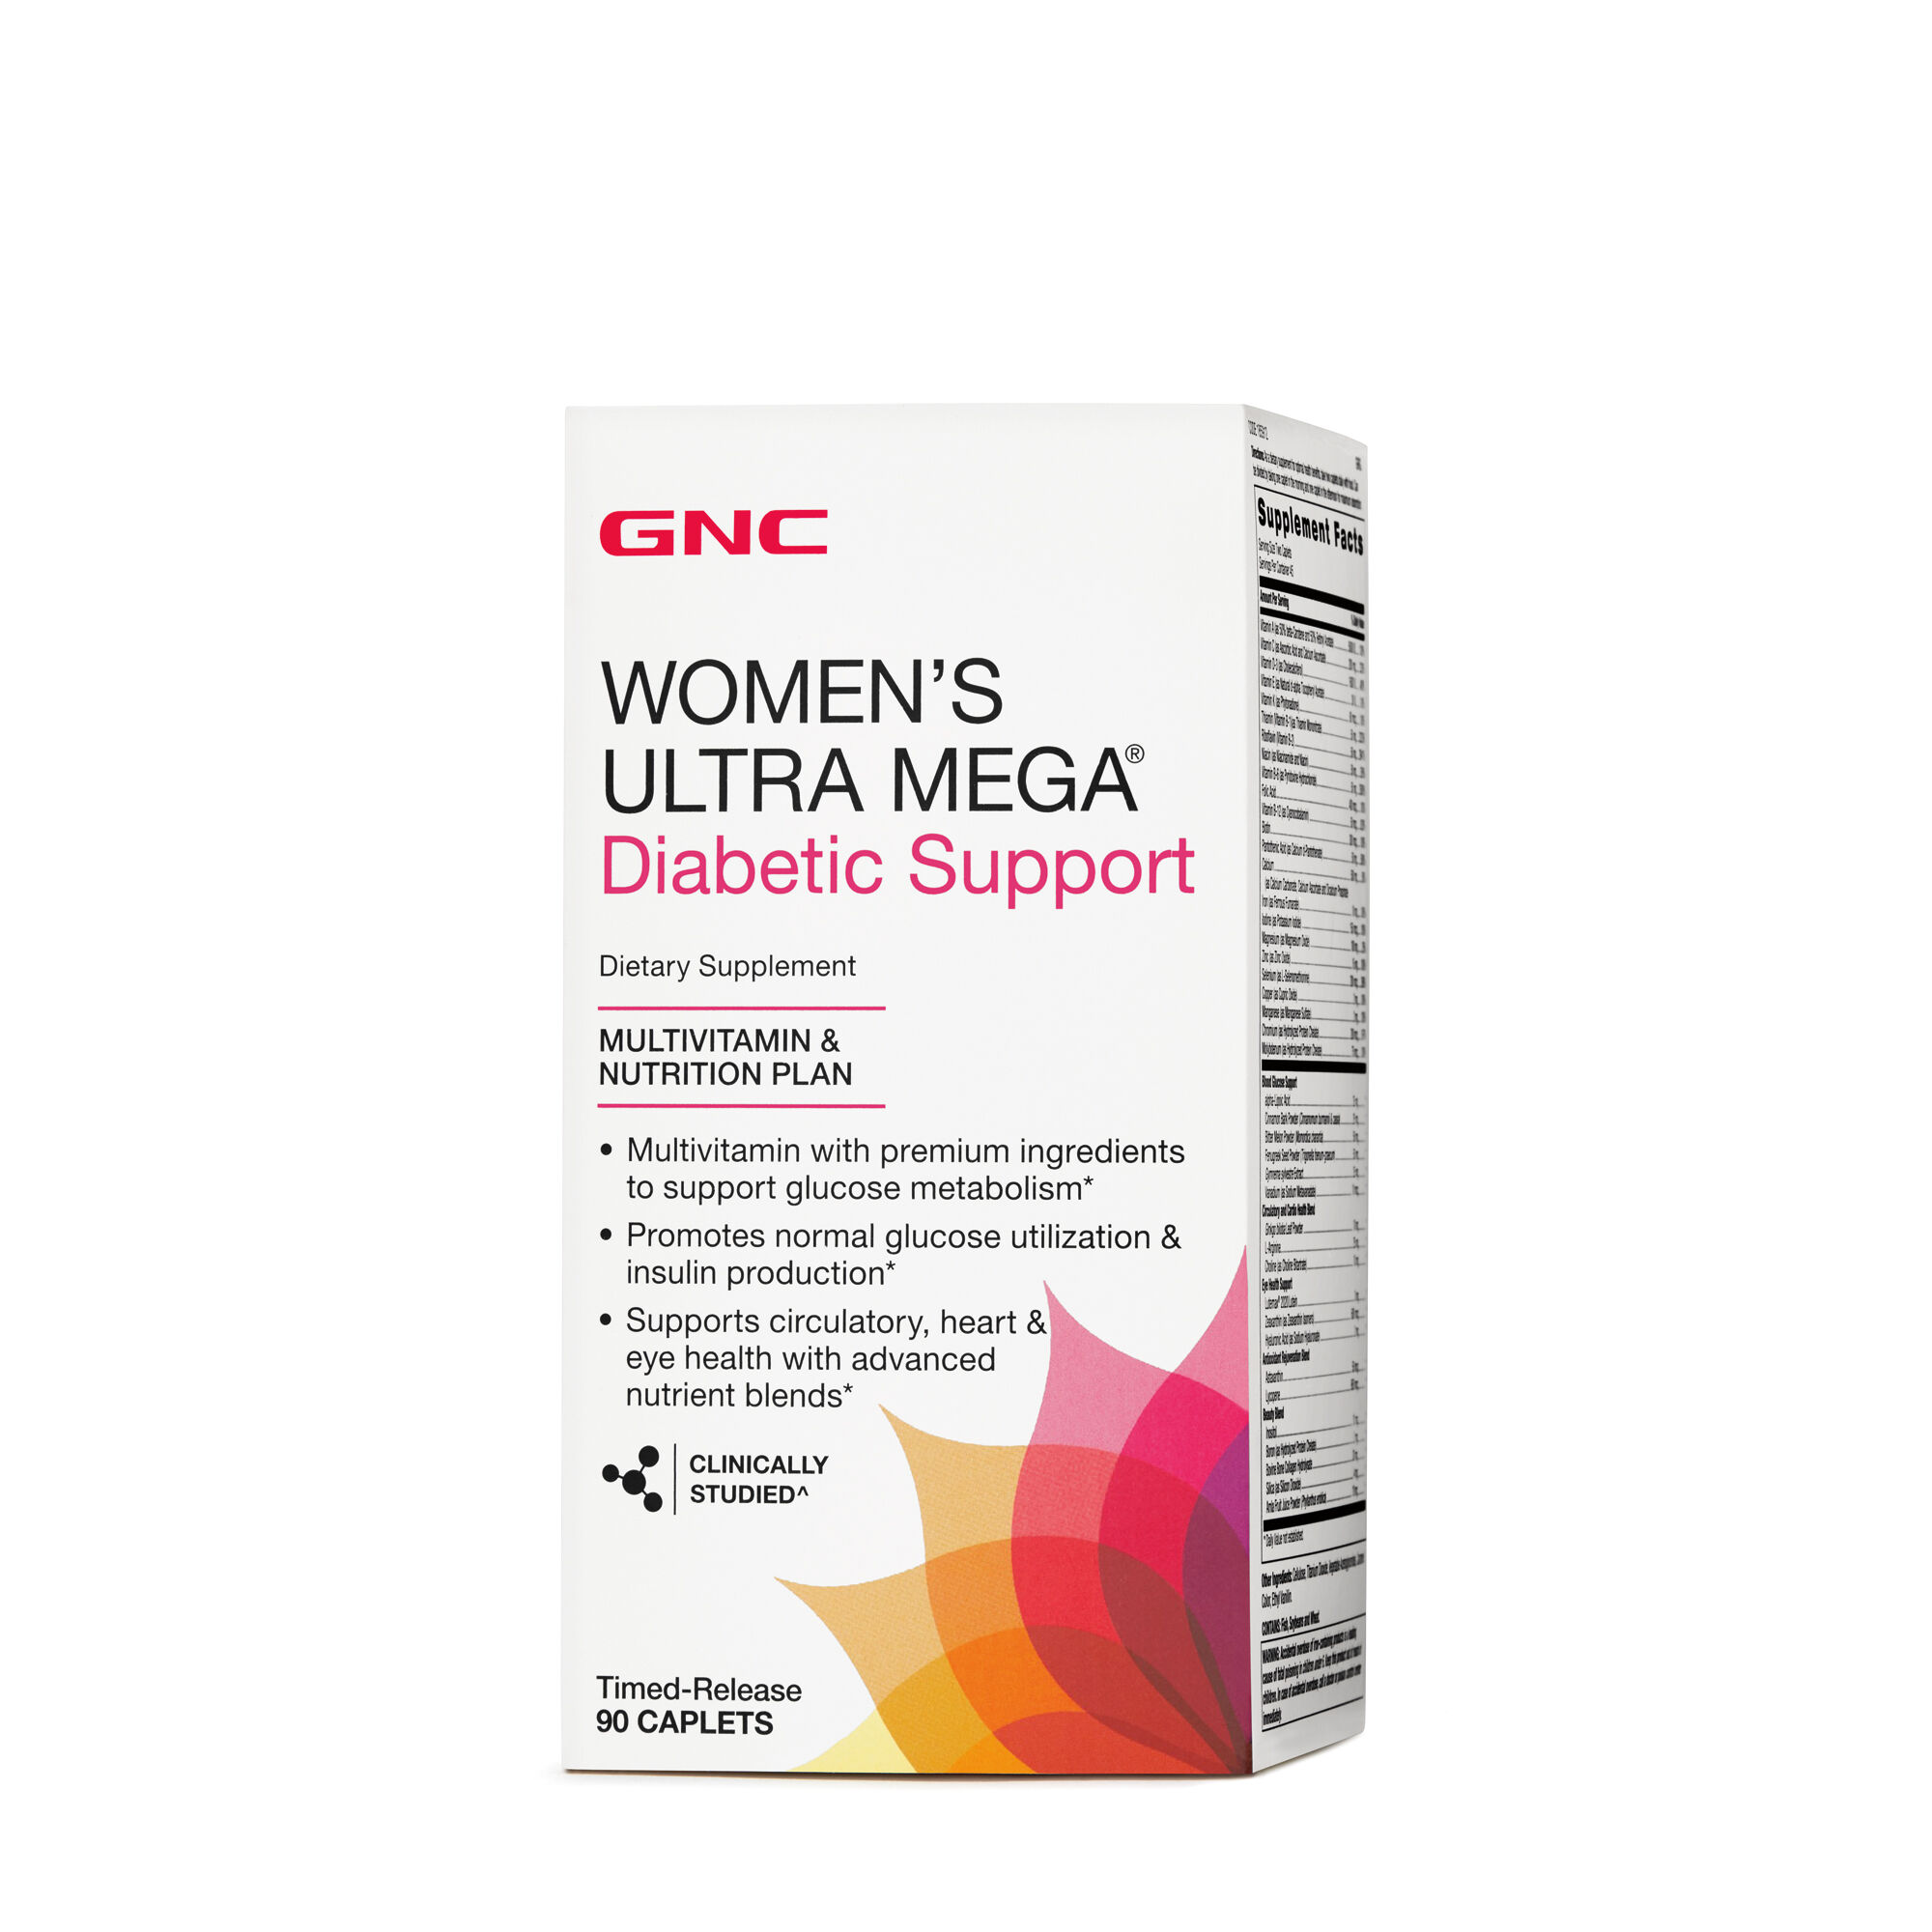 GNC Women's Ultra Mega ® Diabetic Support